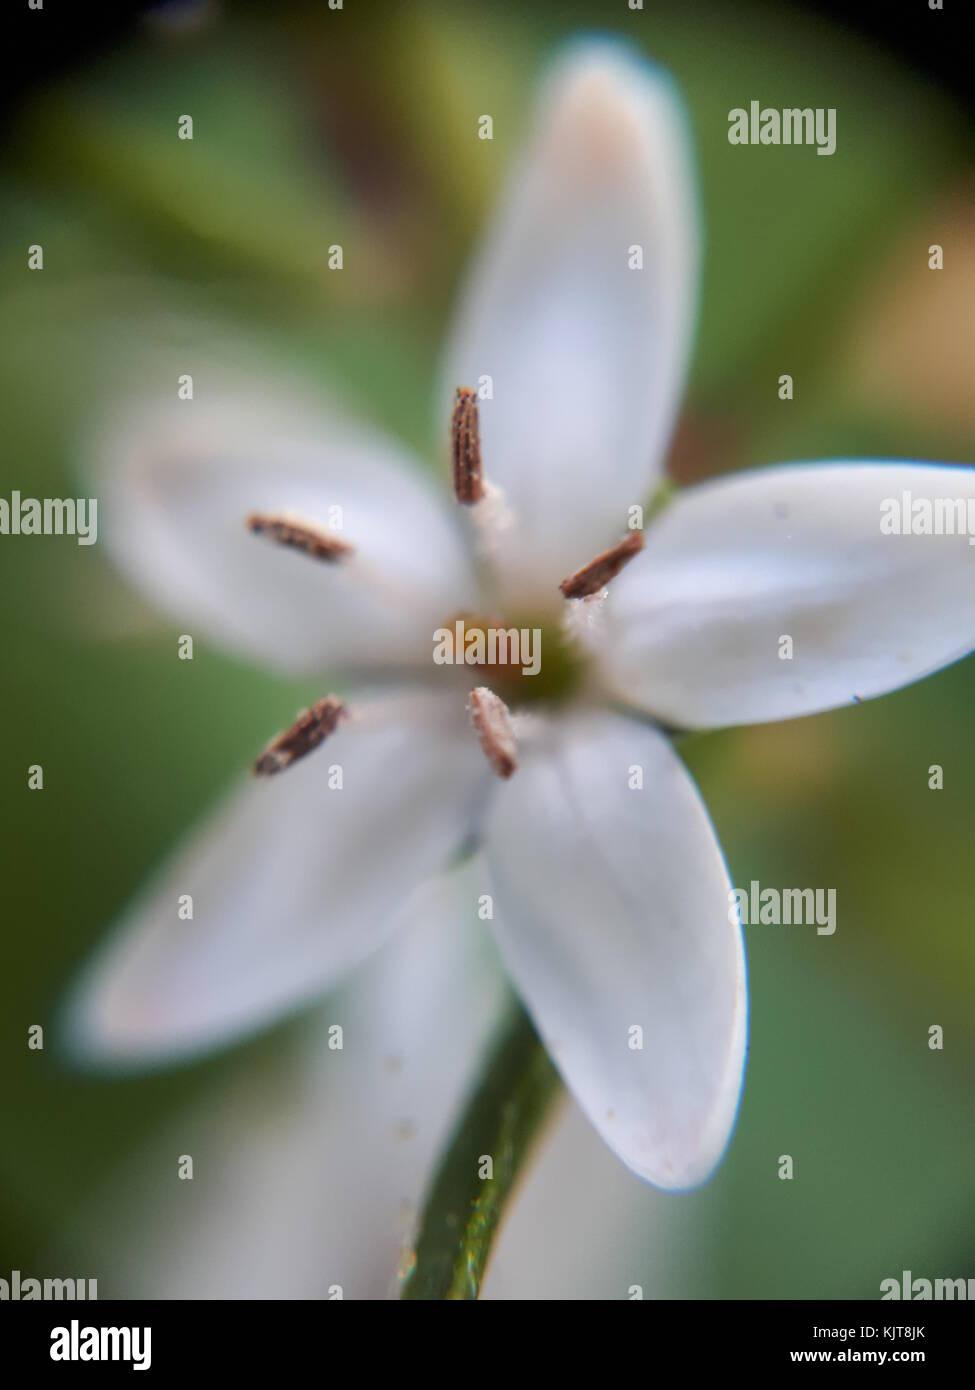 Pretty White Flower Close Up Macro With Five Petals In A Devon